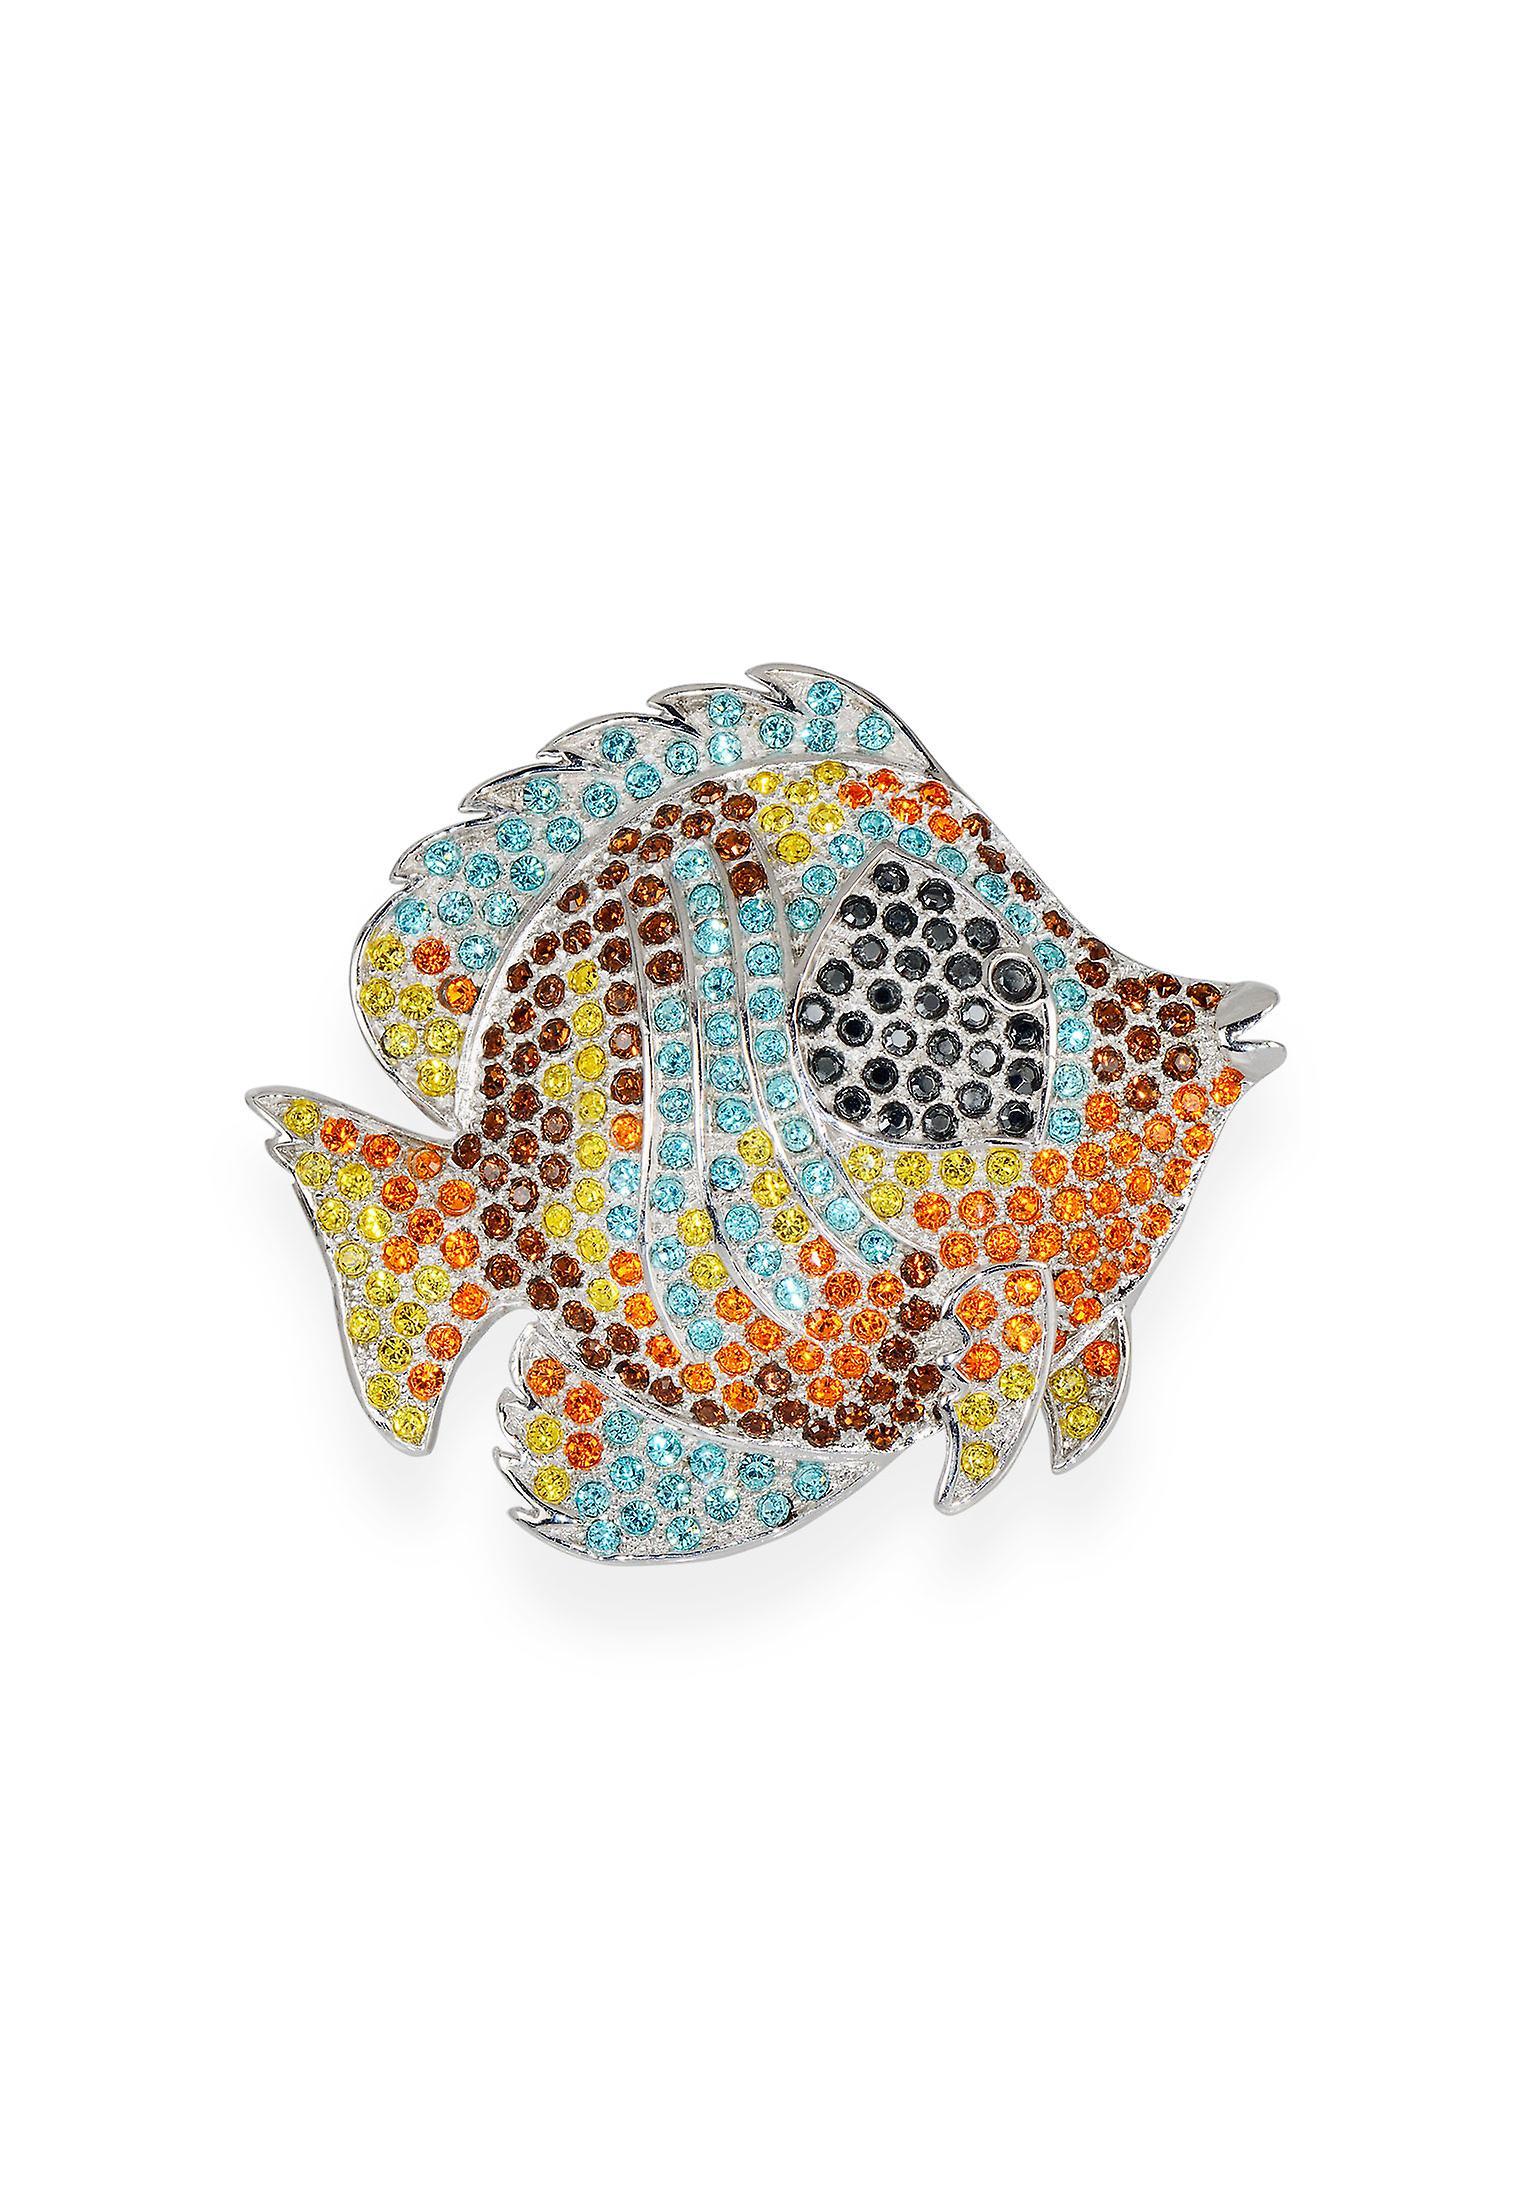 Multicolor brooch with crystals from Swarovski 7111